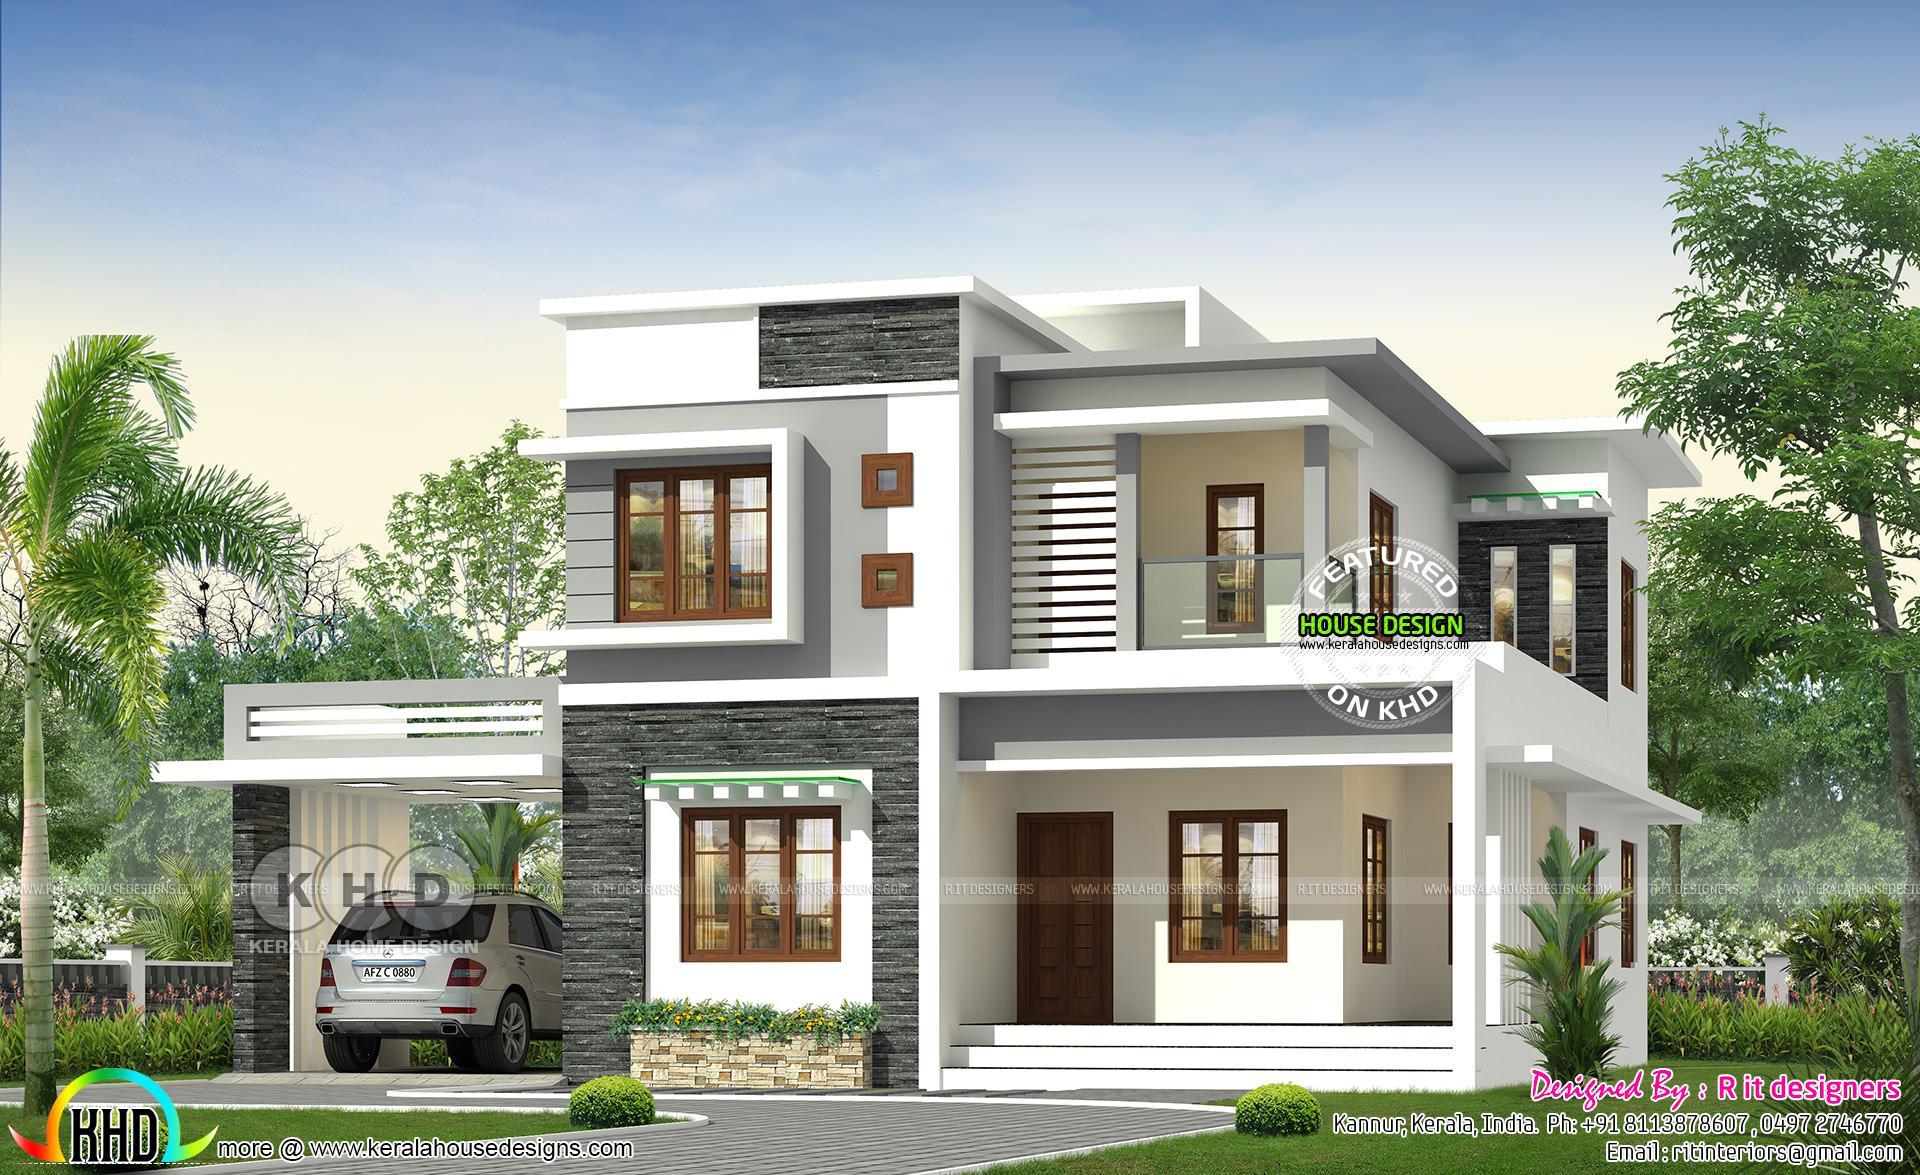 4 Bedroom Modern Home In 2478 Square Feet Kerala Home